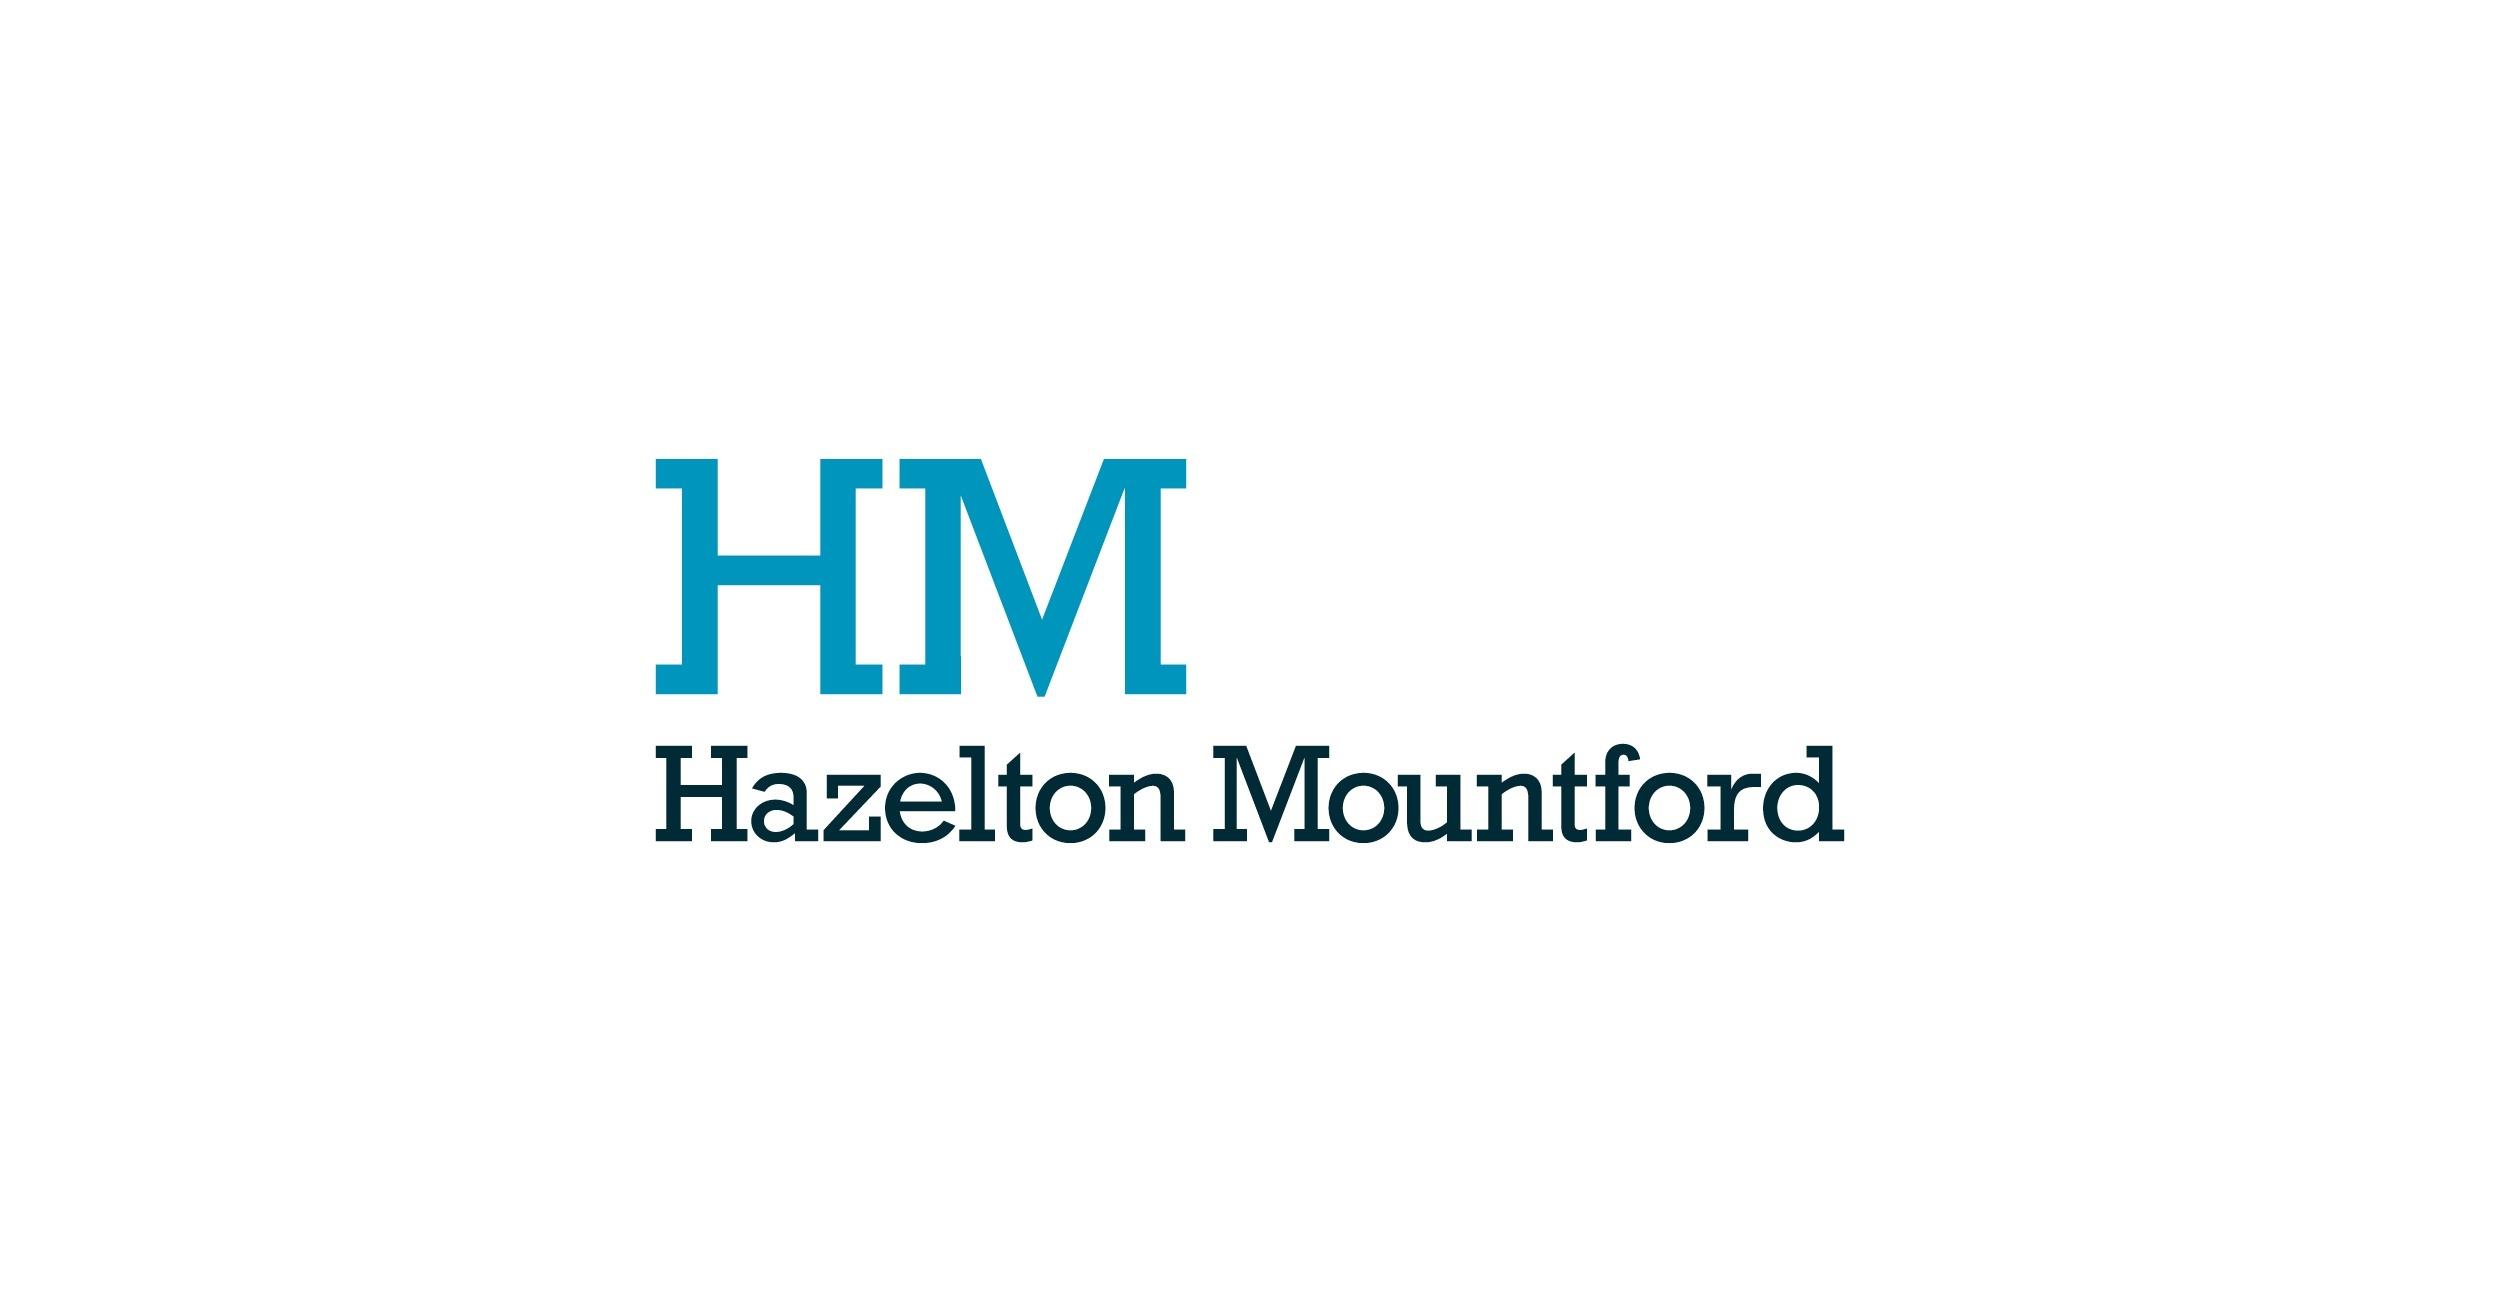 Hazelton Mountford - Brand and Identity